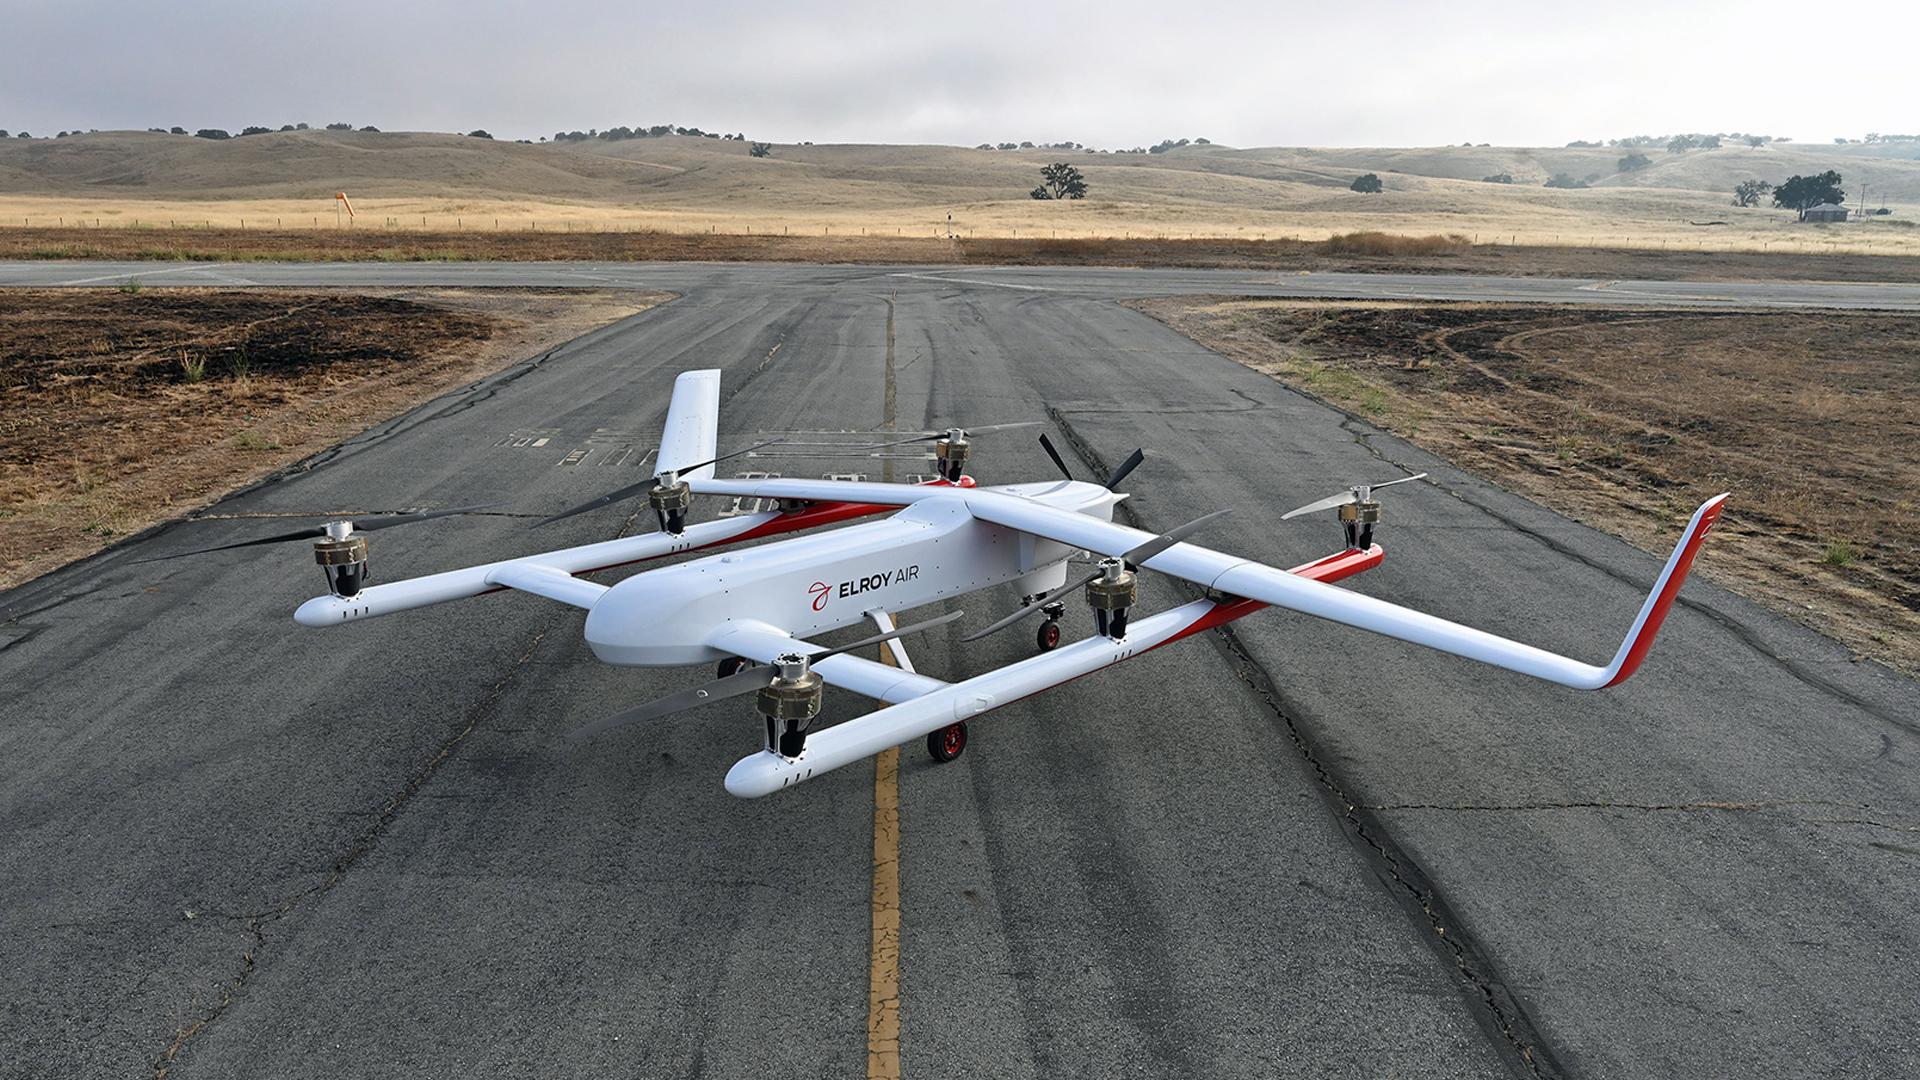 cargo drone on the tarmac